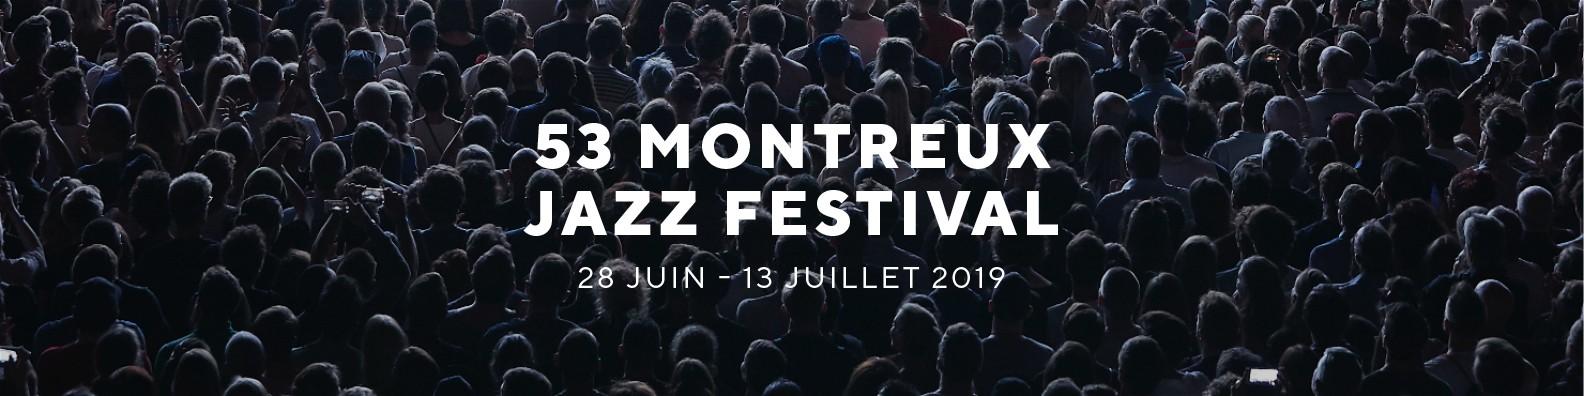 Montreux Jazz Festival >> Montreux Jazz Festival Linkedin